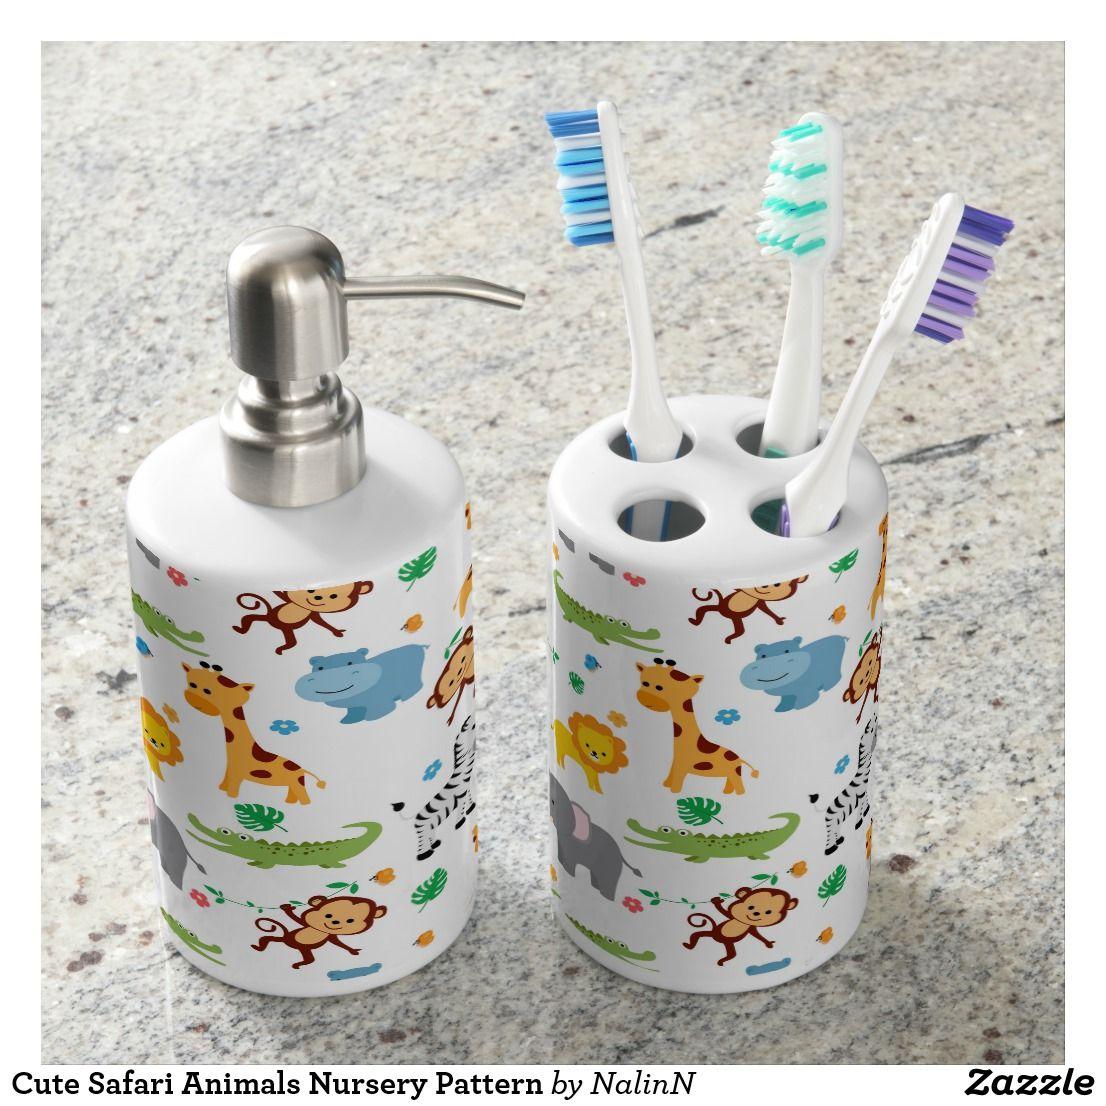 Cute Safari Animals Nursery Pattern Bathroom Set | Bath Sets ...